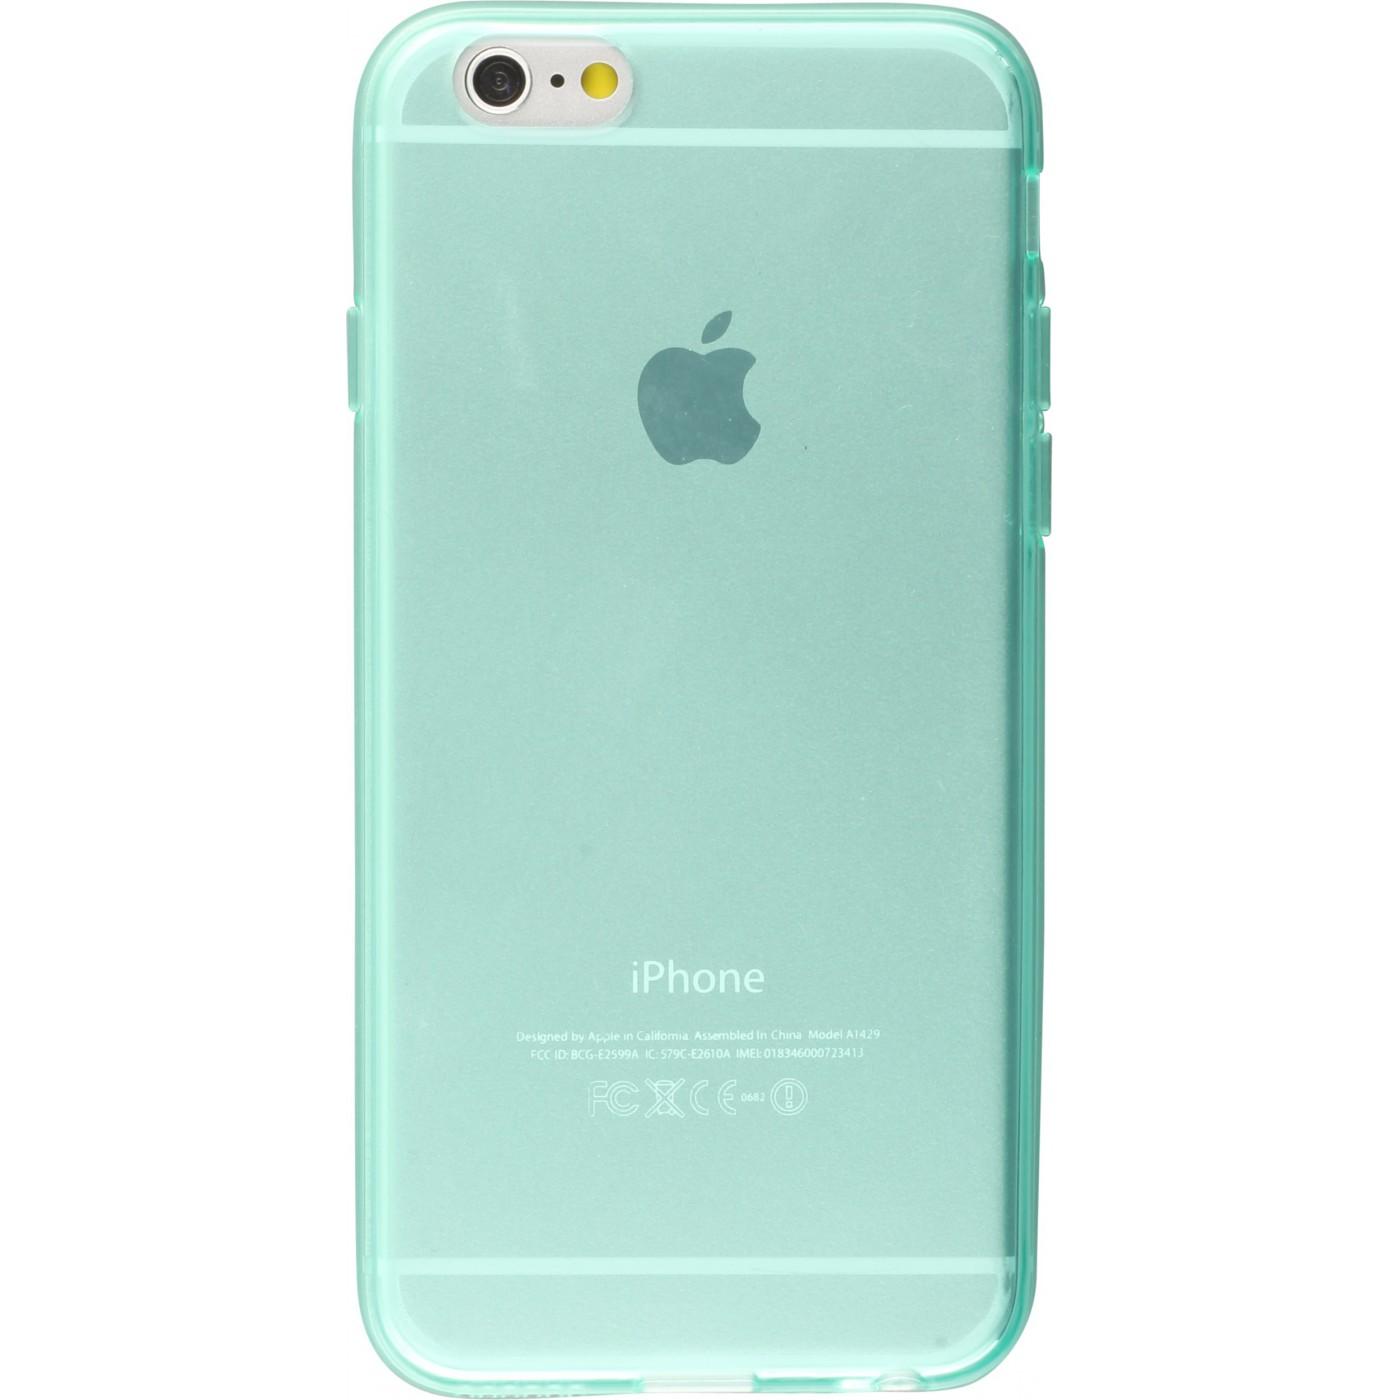 Housse Iphone 6 6s Gel Transparent Vert Menthe